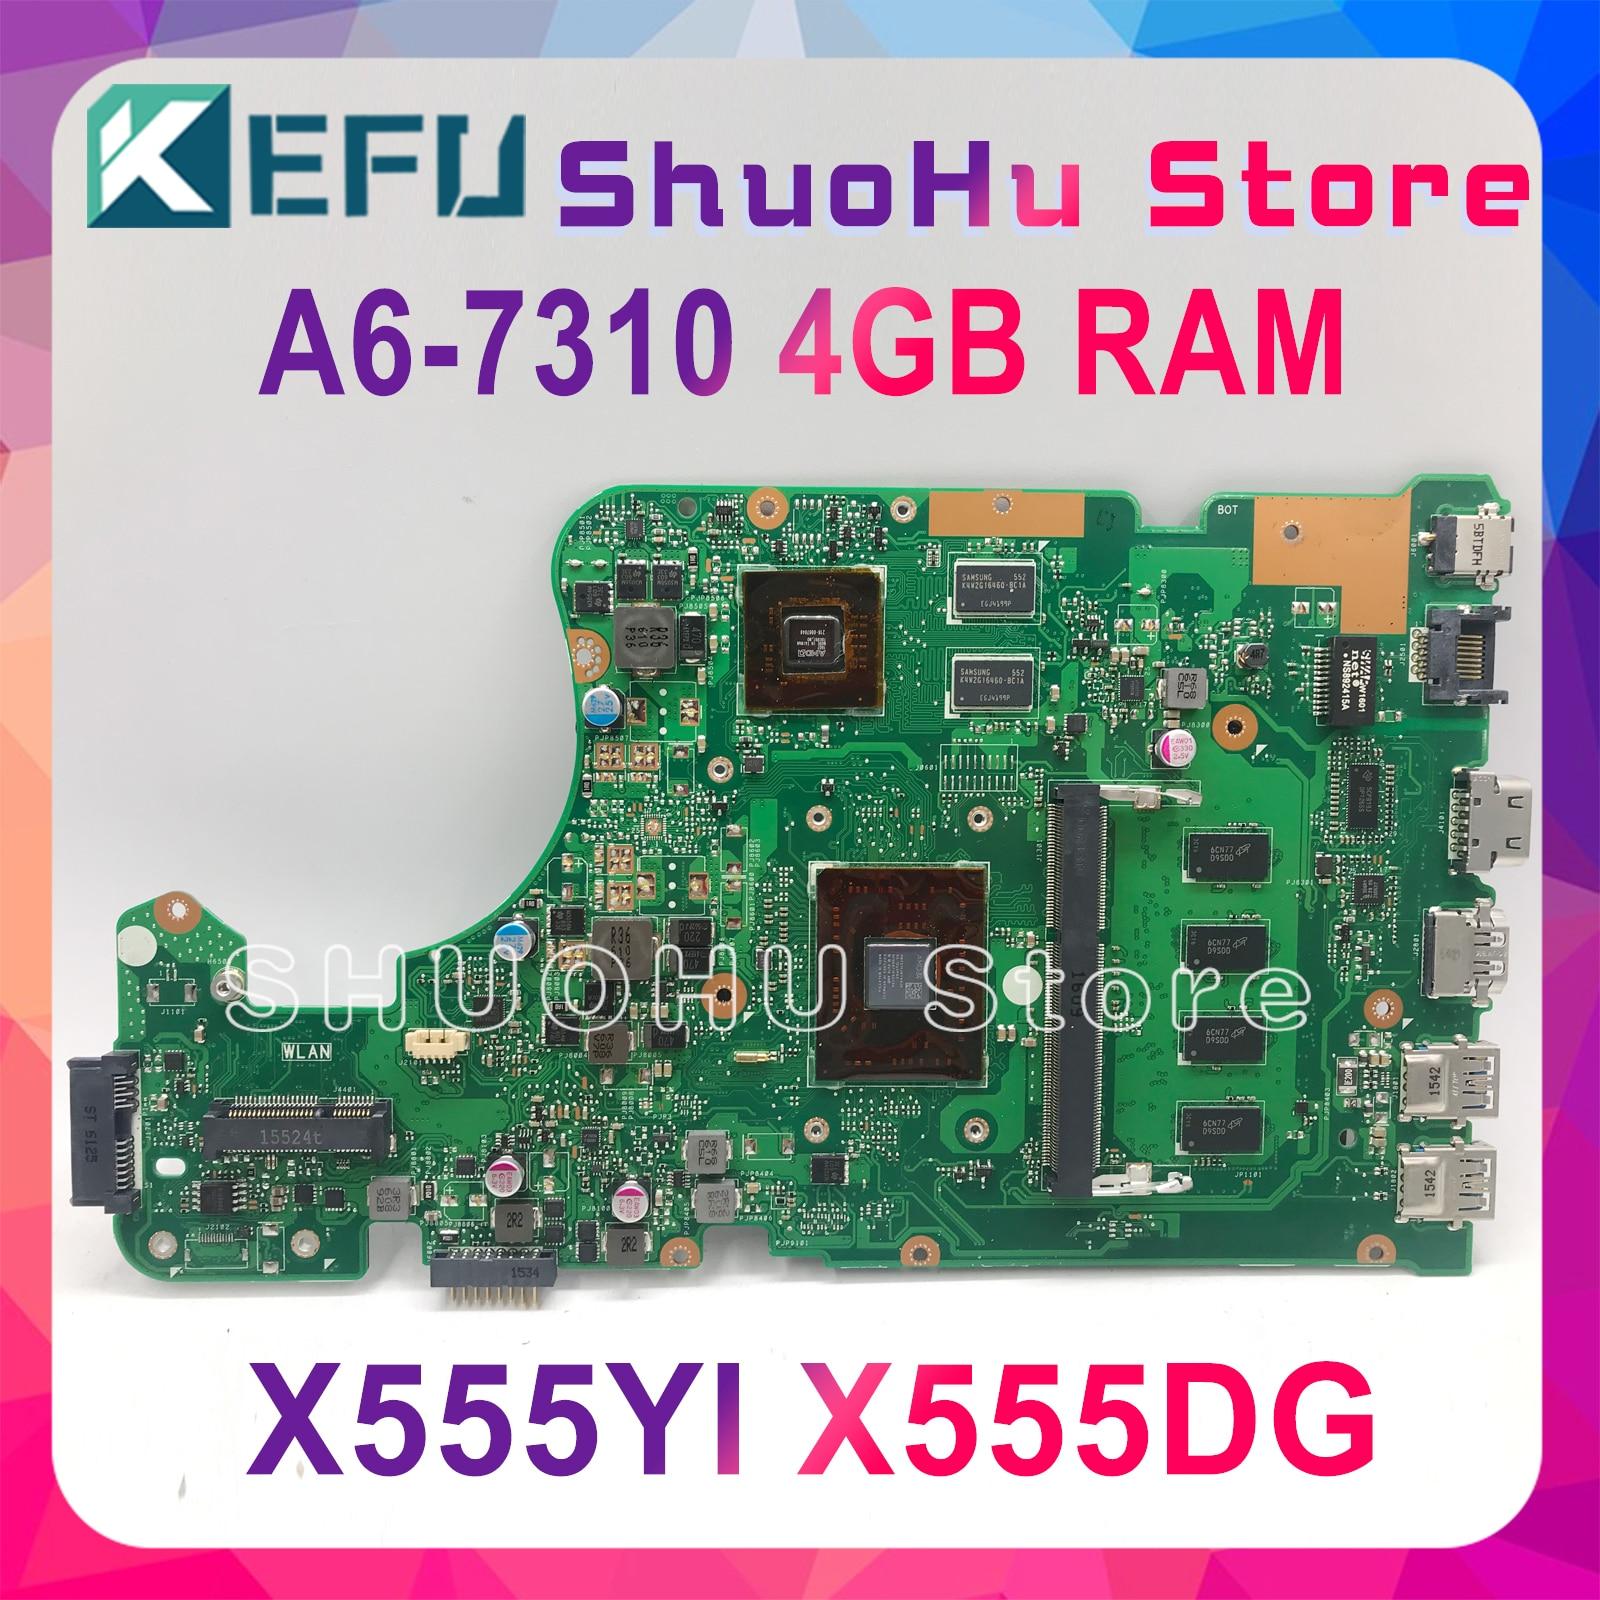 KEFU X555DG Motherboard FIT For ASUS X555DG A555DG X555QG X555YI Laptop Motherboard A6-7310 R5-M320 4GB Test Work 100%